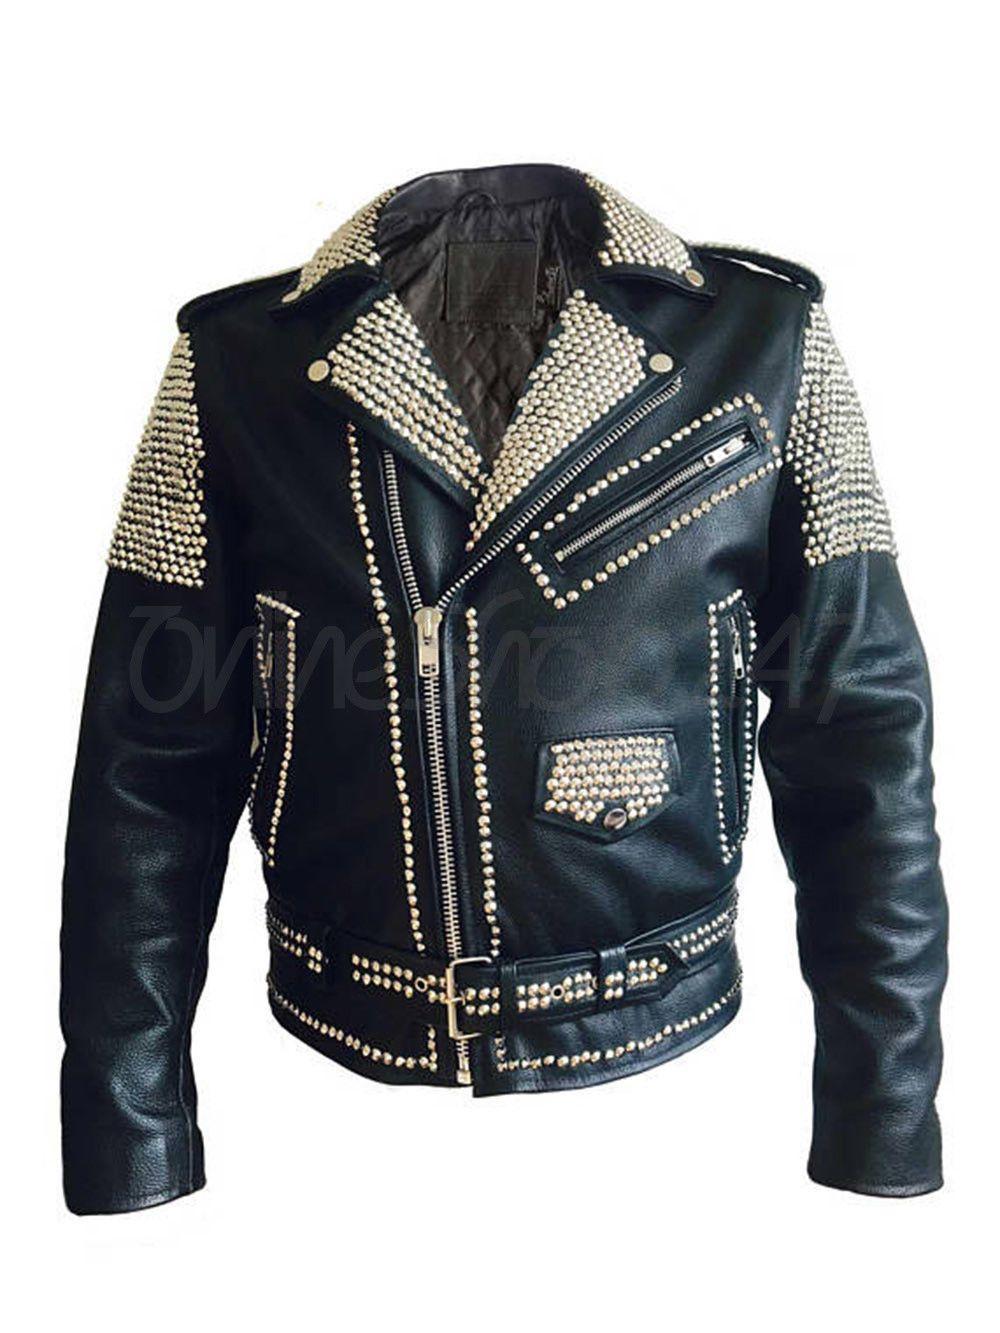 New Mens Punk El Patron Black Full Silver Spiked Studded Brando Leather Jacket Leather Jacket Spiked Leather Jacket Leather Jacket Men [ 1333 x 1000 Pixel ]